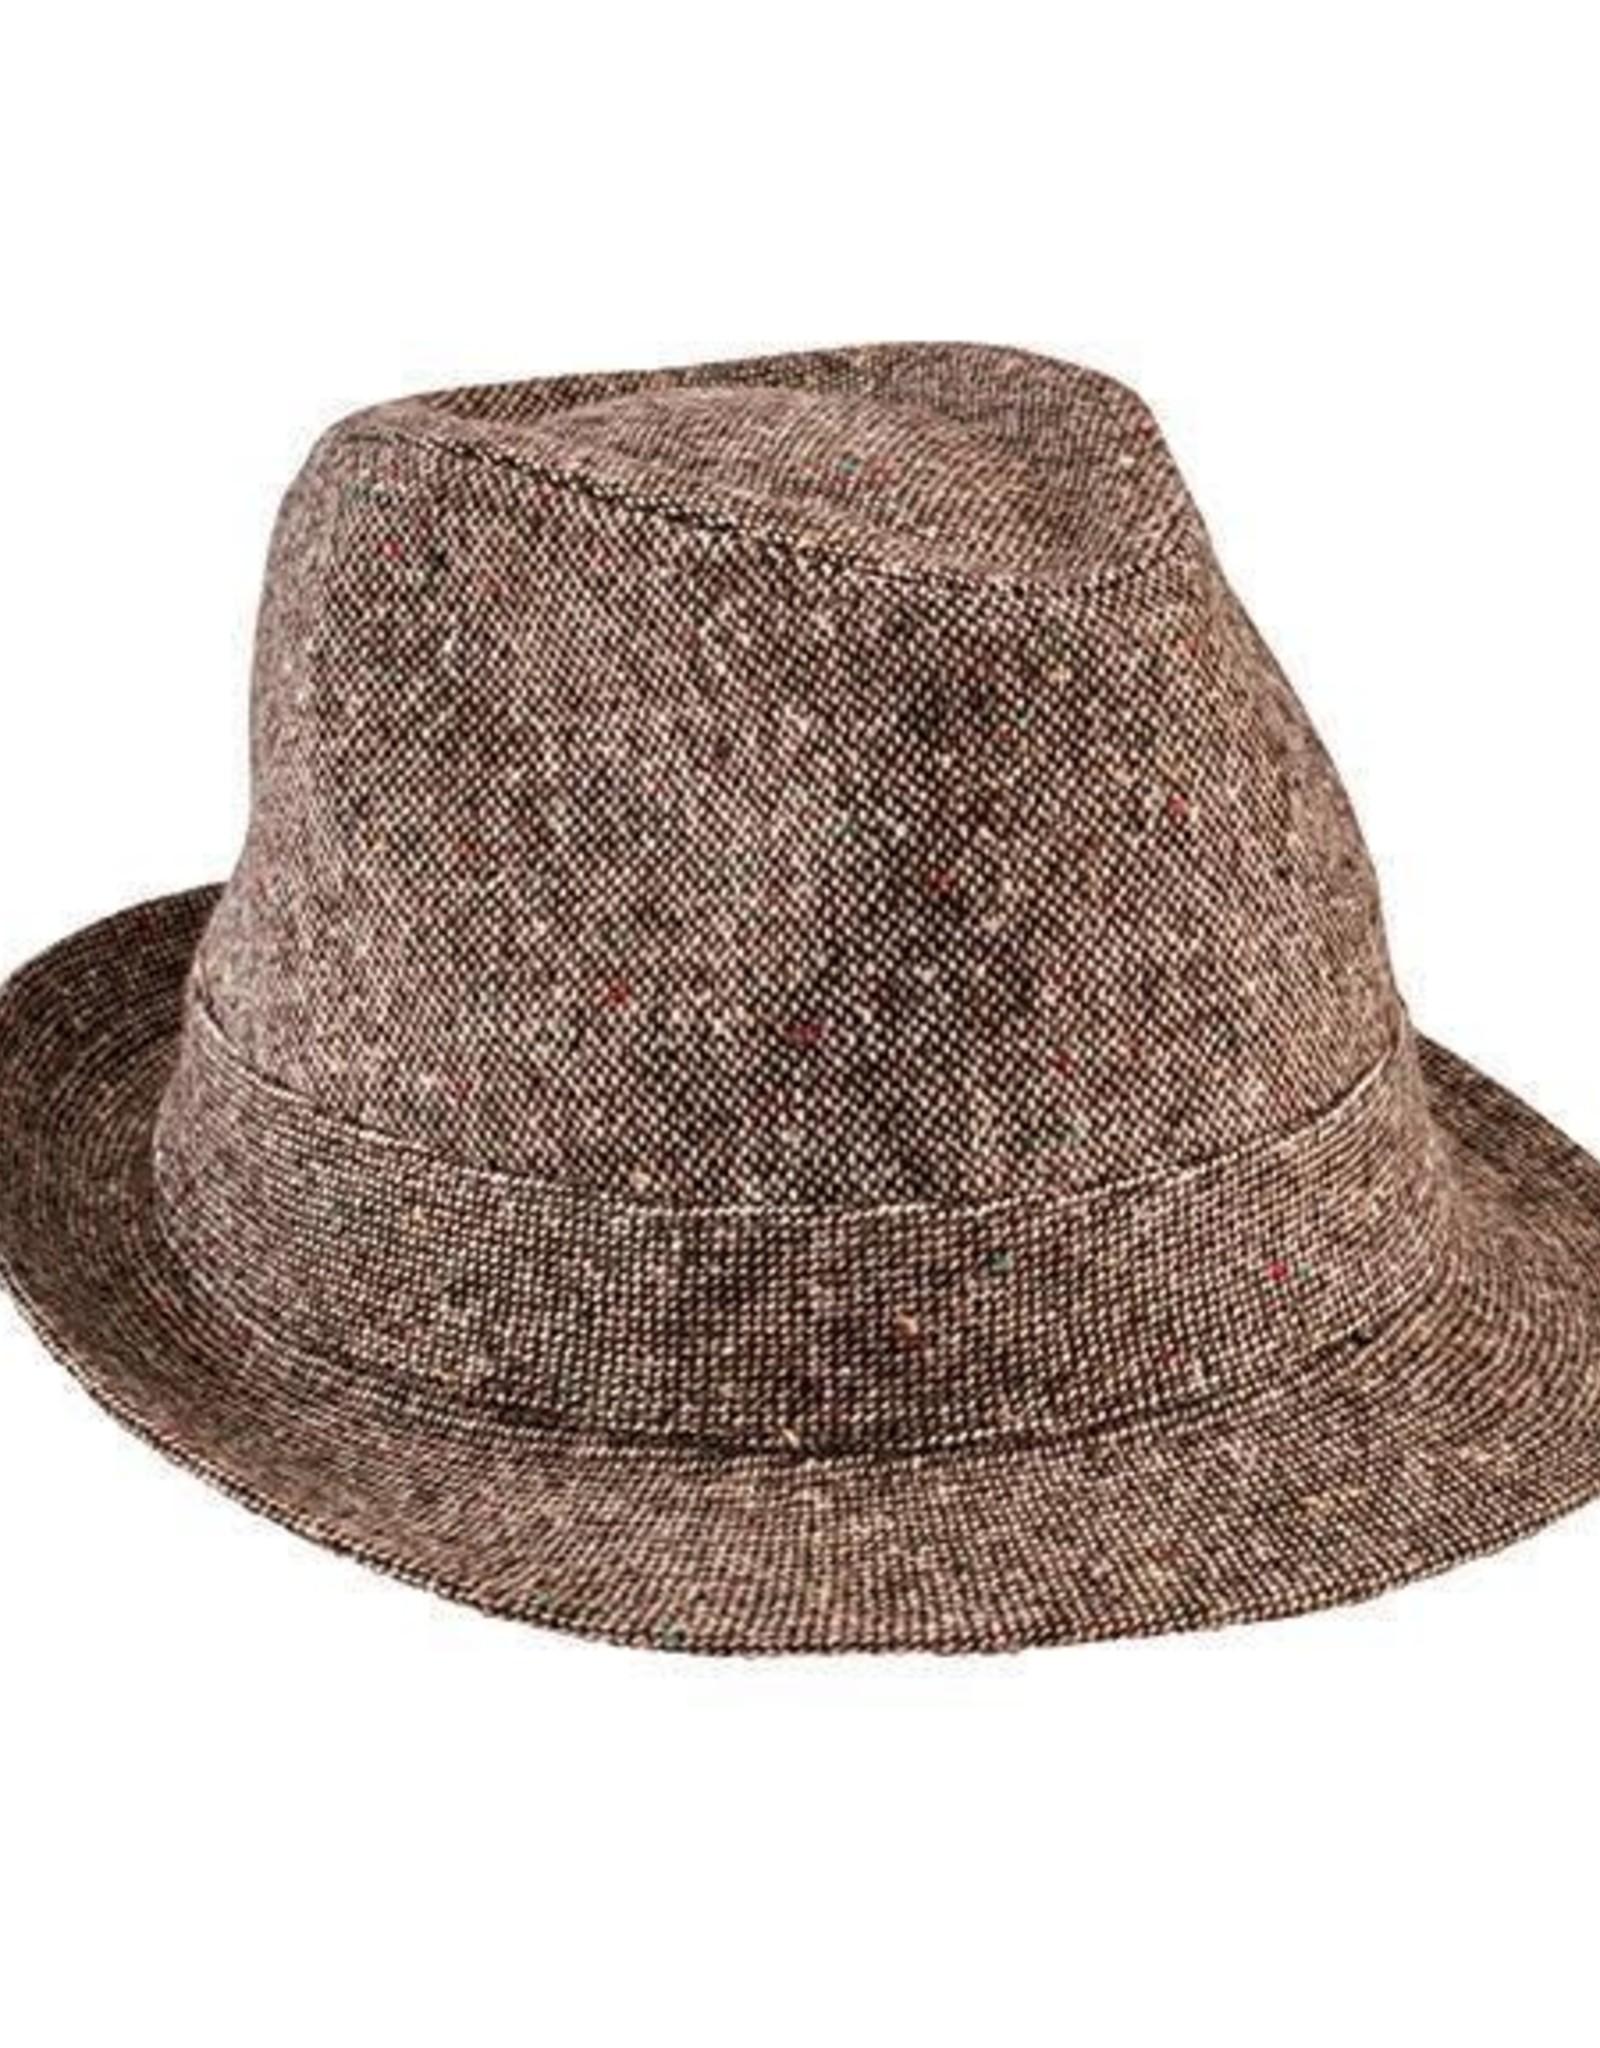 San Diego Hat Company San Diego Hat Co. | Kids Tweed Fedora - brown